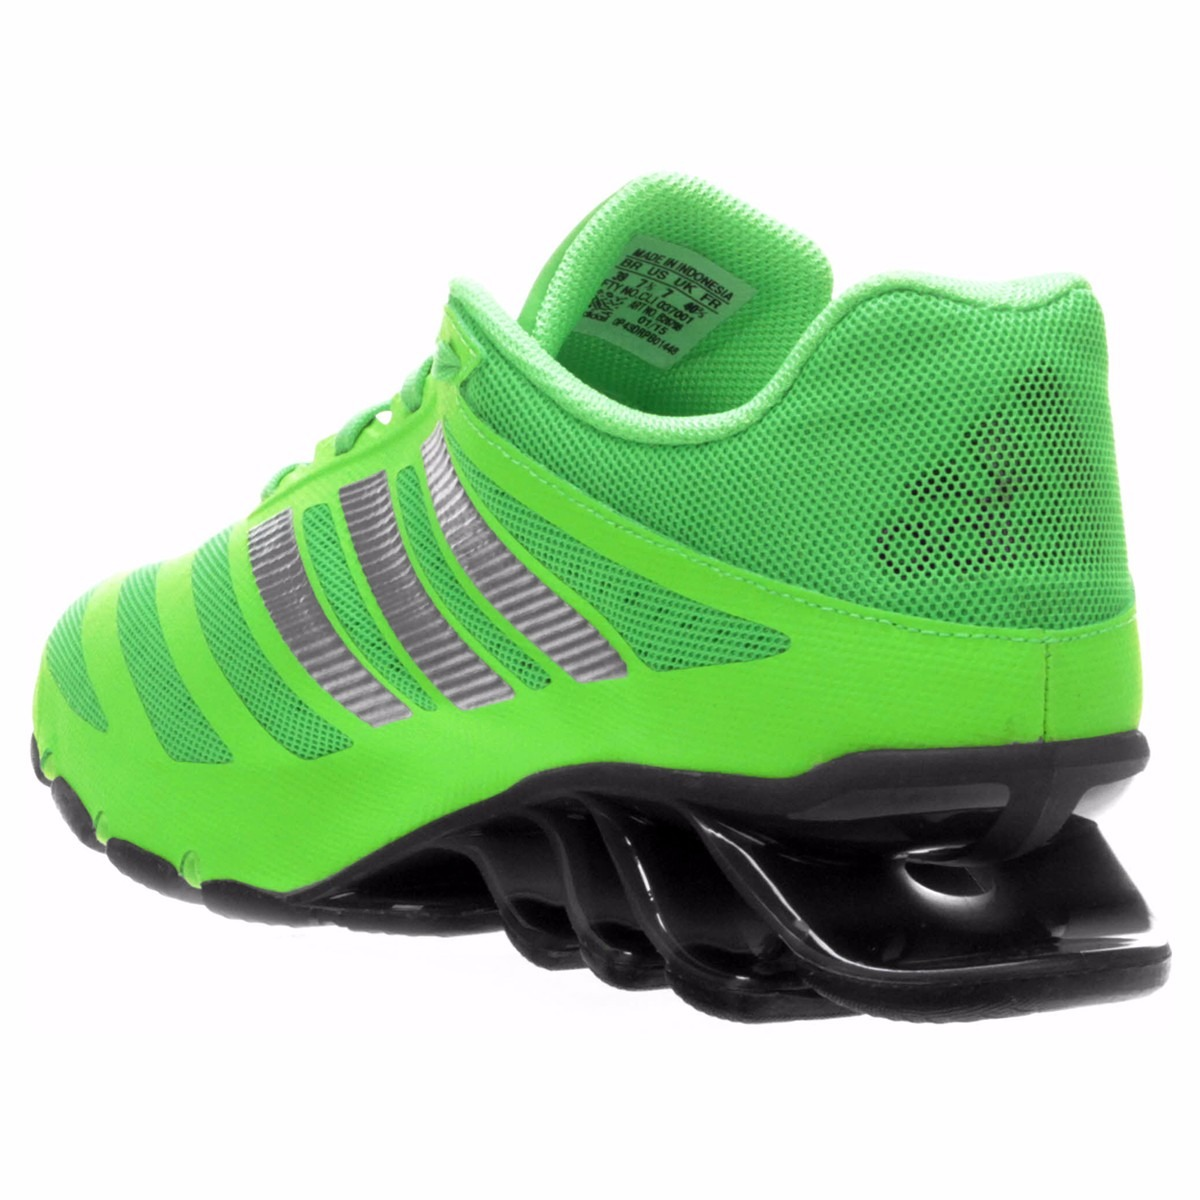 wholesale dealer d13fc 4f116 adidas springblade ignite white green